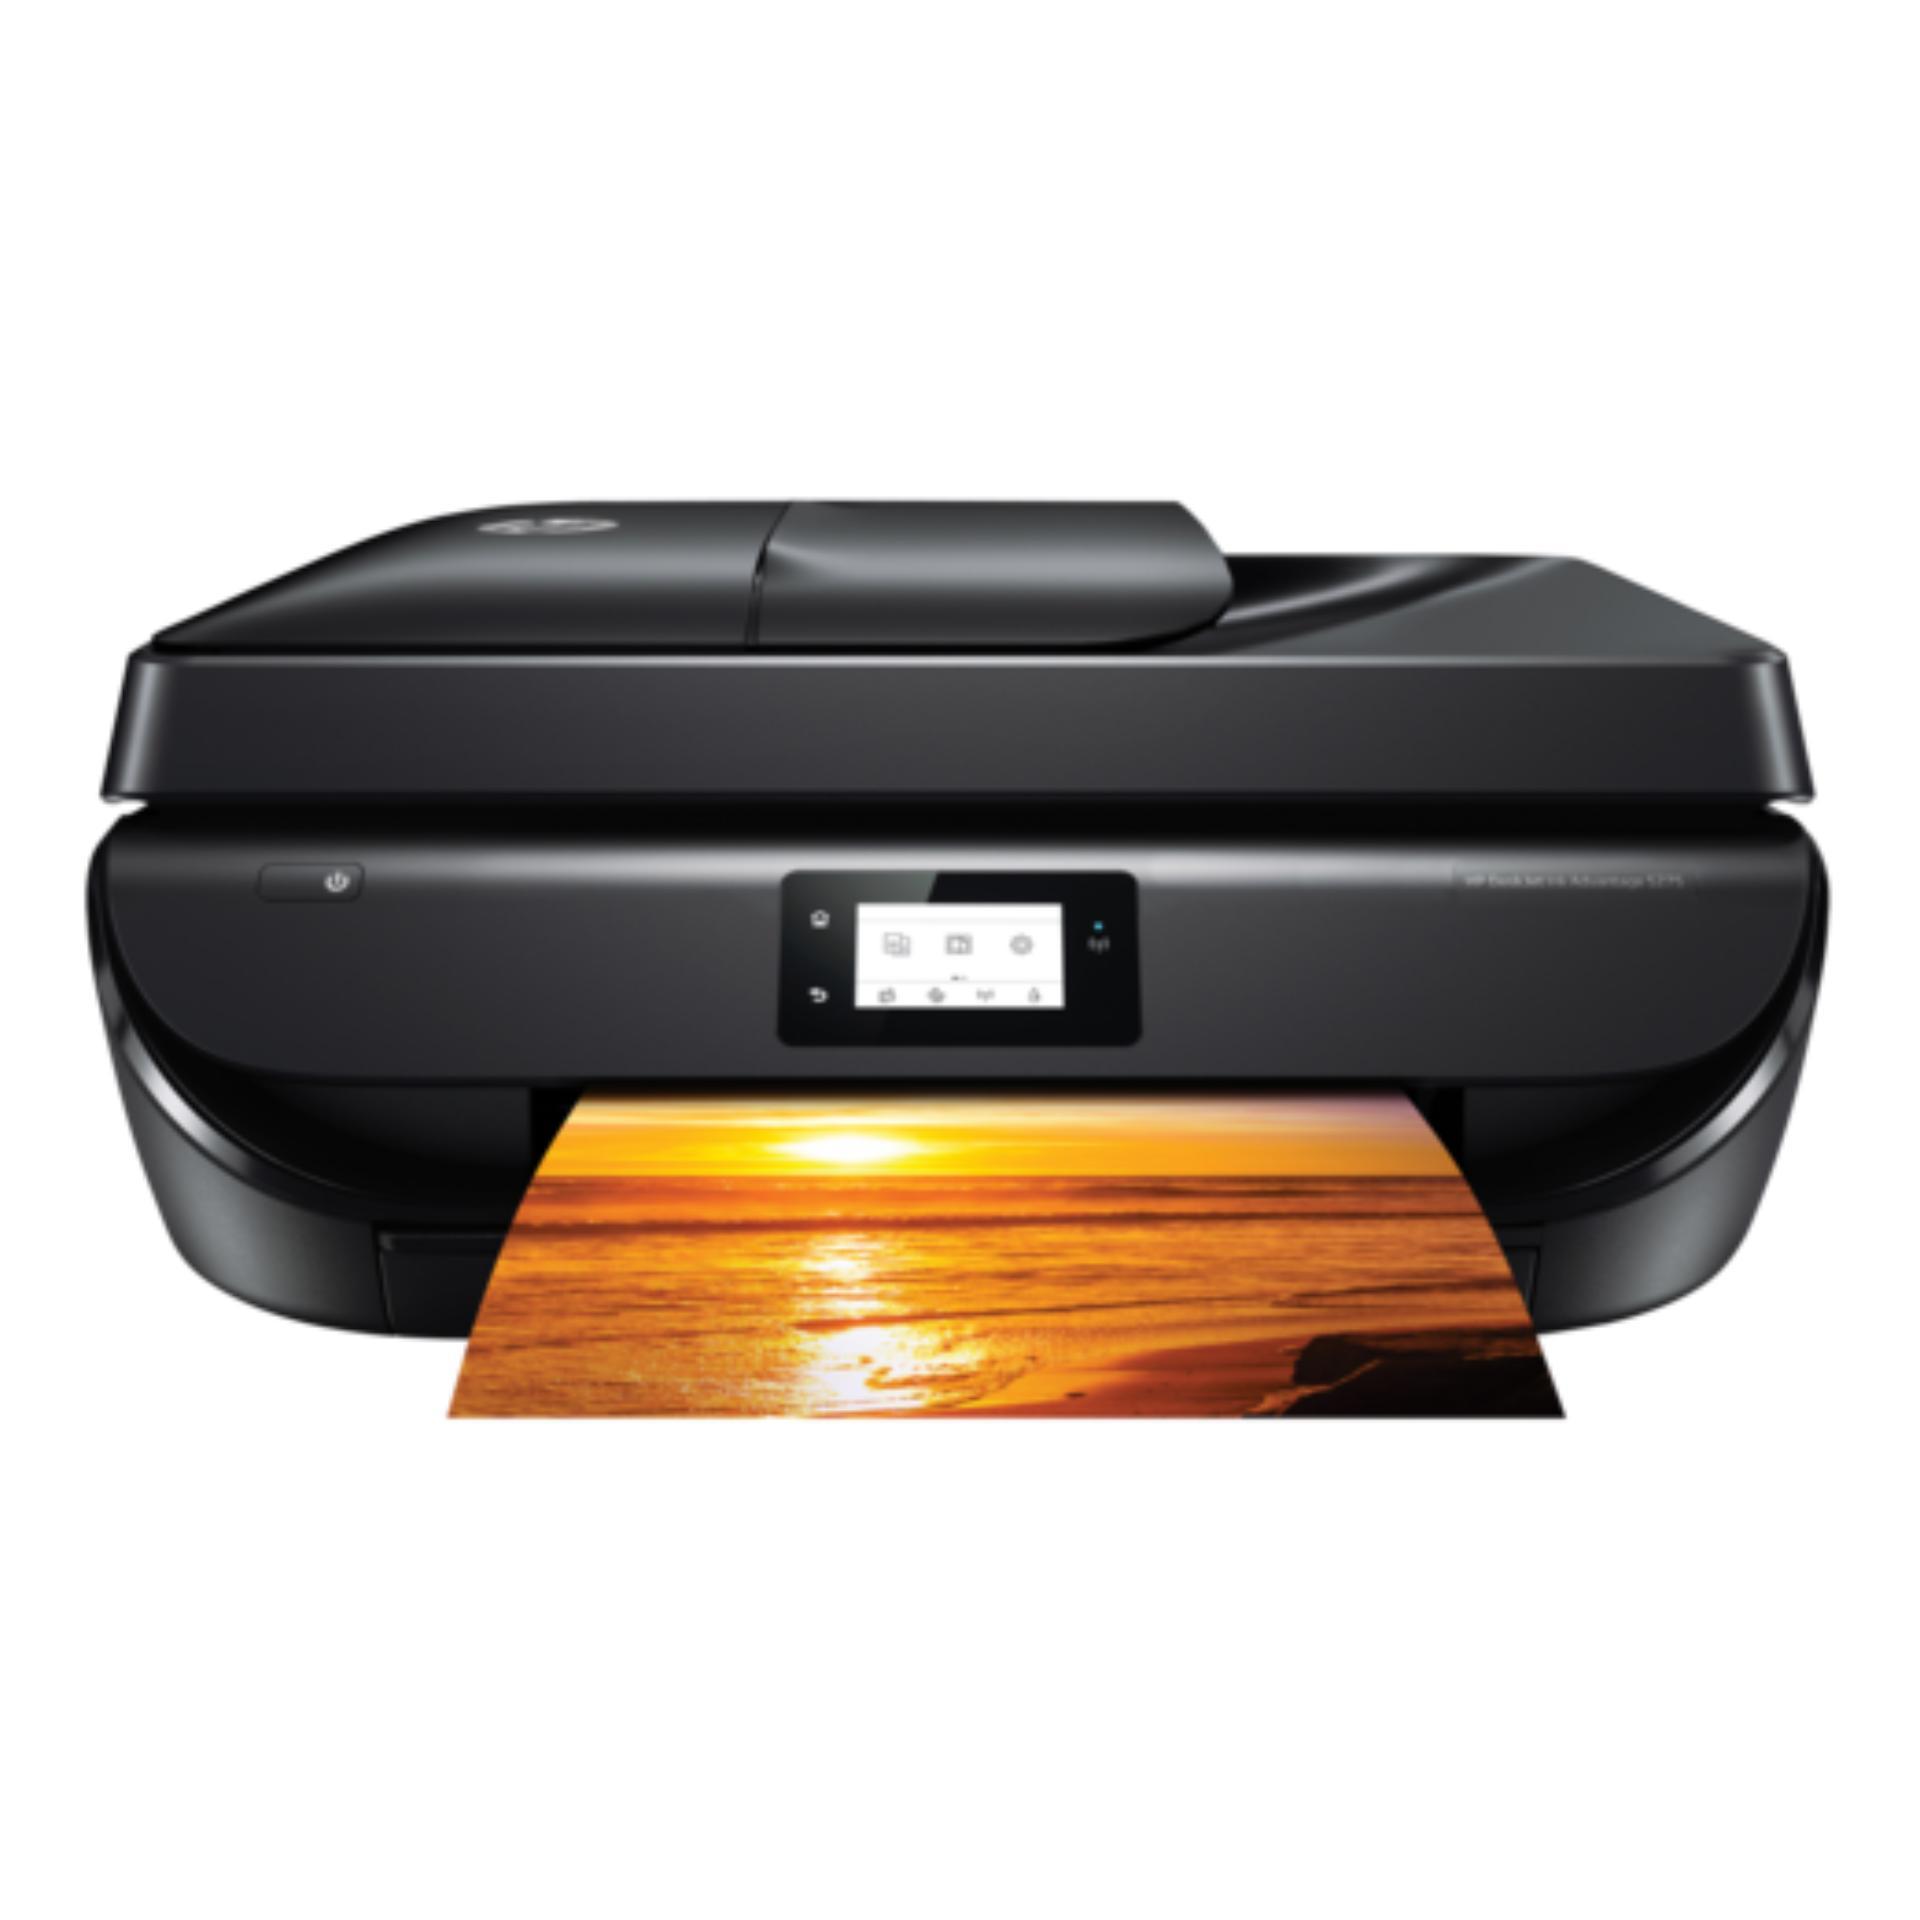 Hp Philippines Price List Laptop Printer For Sale Lazada Block Diagram Hpcolorlaserjetcp5220 Deskjet Ink Advantage 5275 Print Copy Scan Fax Photo